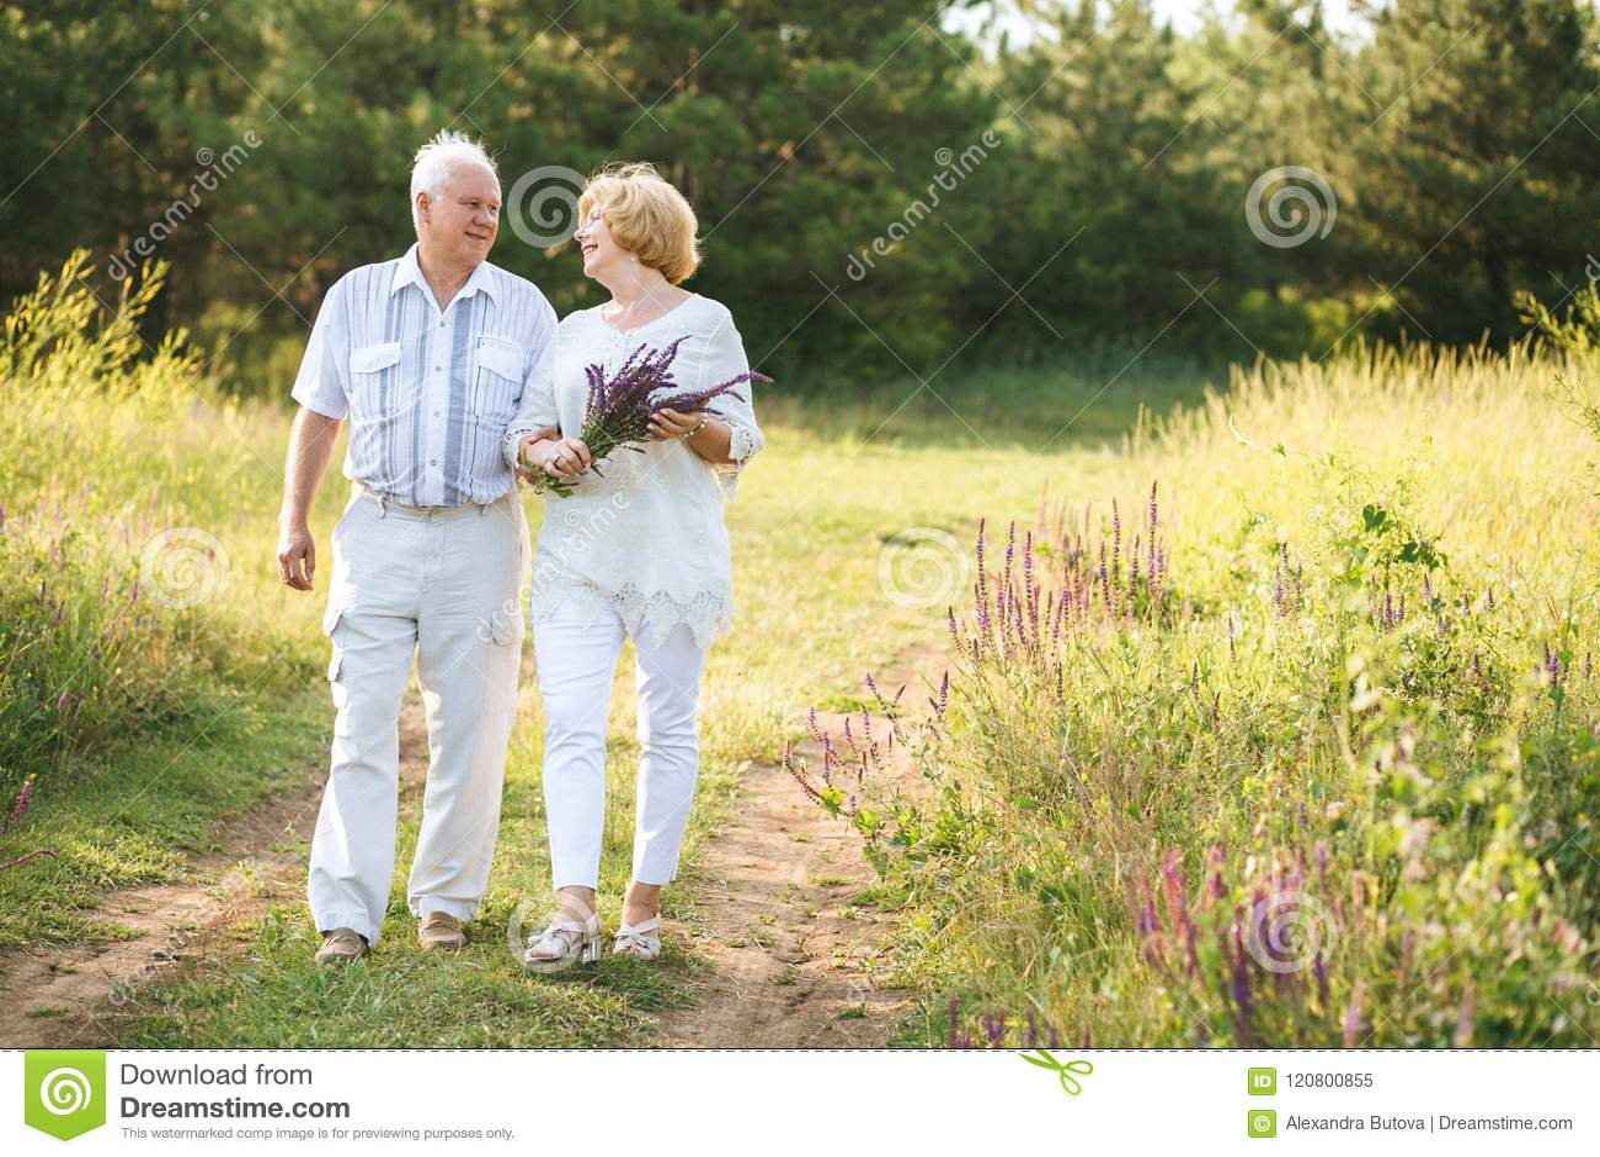 953de40a4ae4 Elderly Couple In The White Linen Dress Walking Outdoors